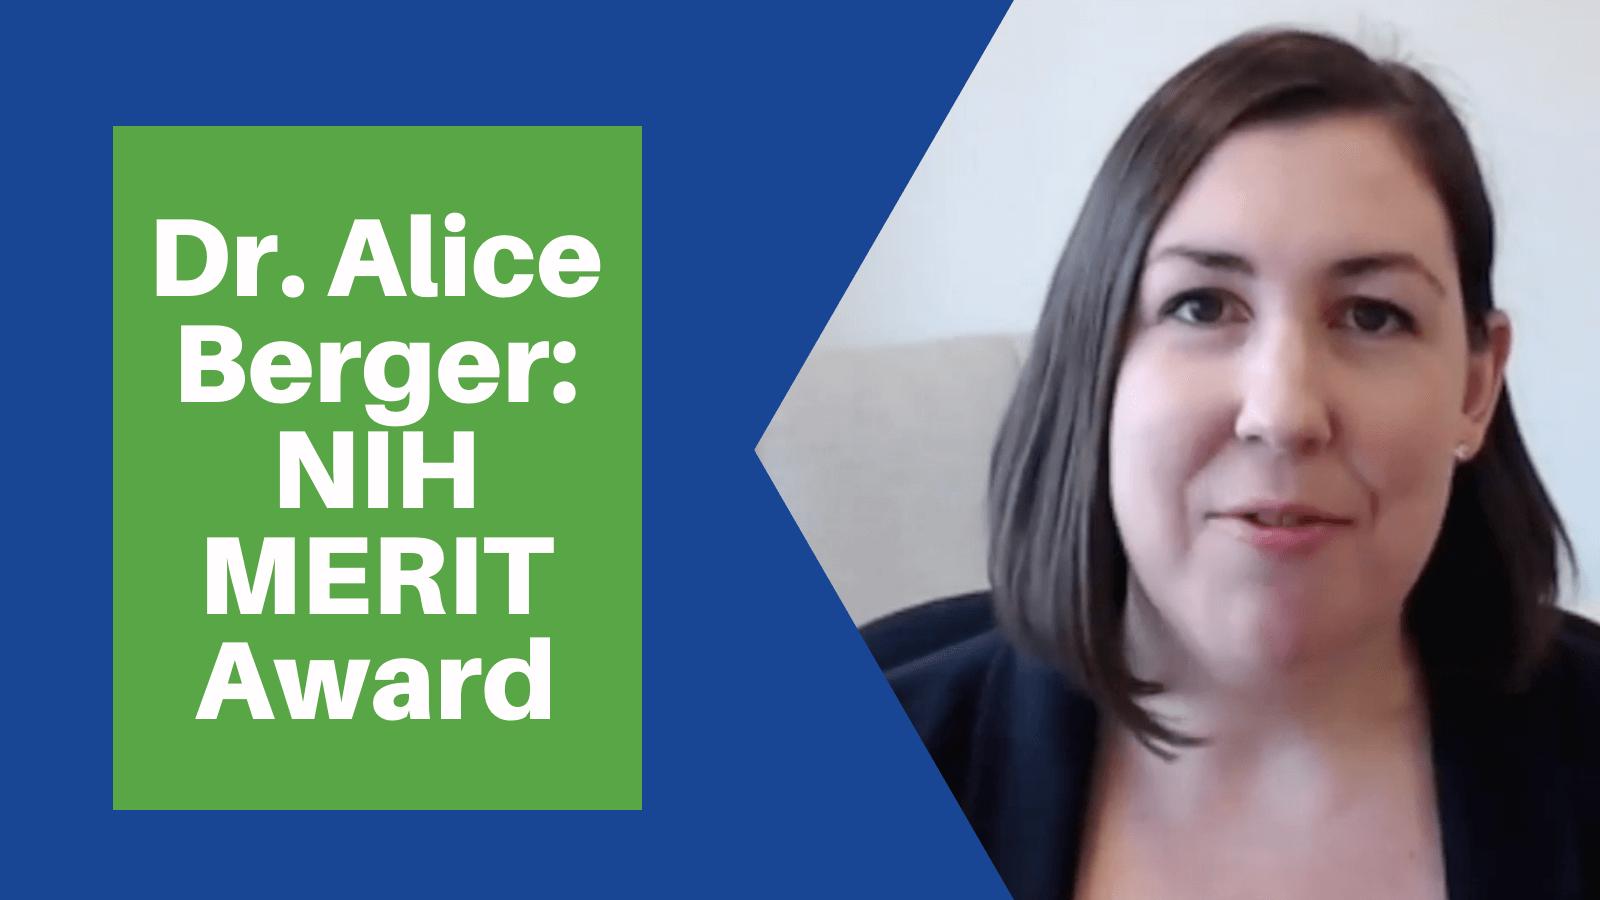 Dr. Alice Berger receives NIH Merit Award